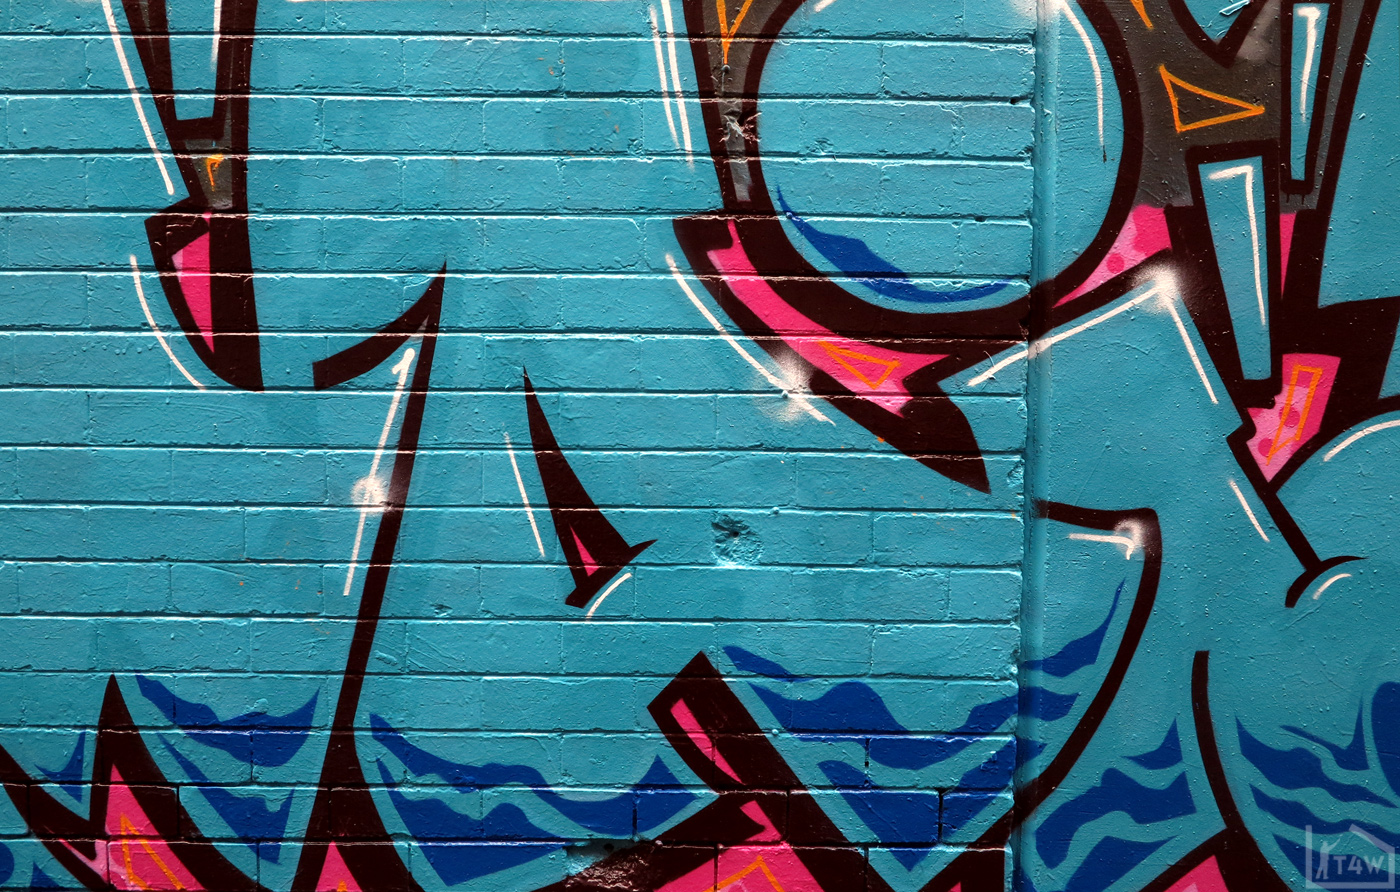 the-fourth-walls-melbourne-graffiti-sup-dvate-petals-daisy-maid-sigs-sabeth-pornograffixxx-fitzroy7